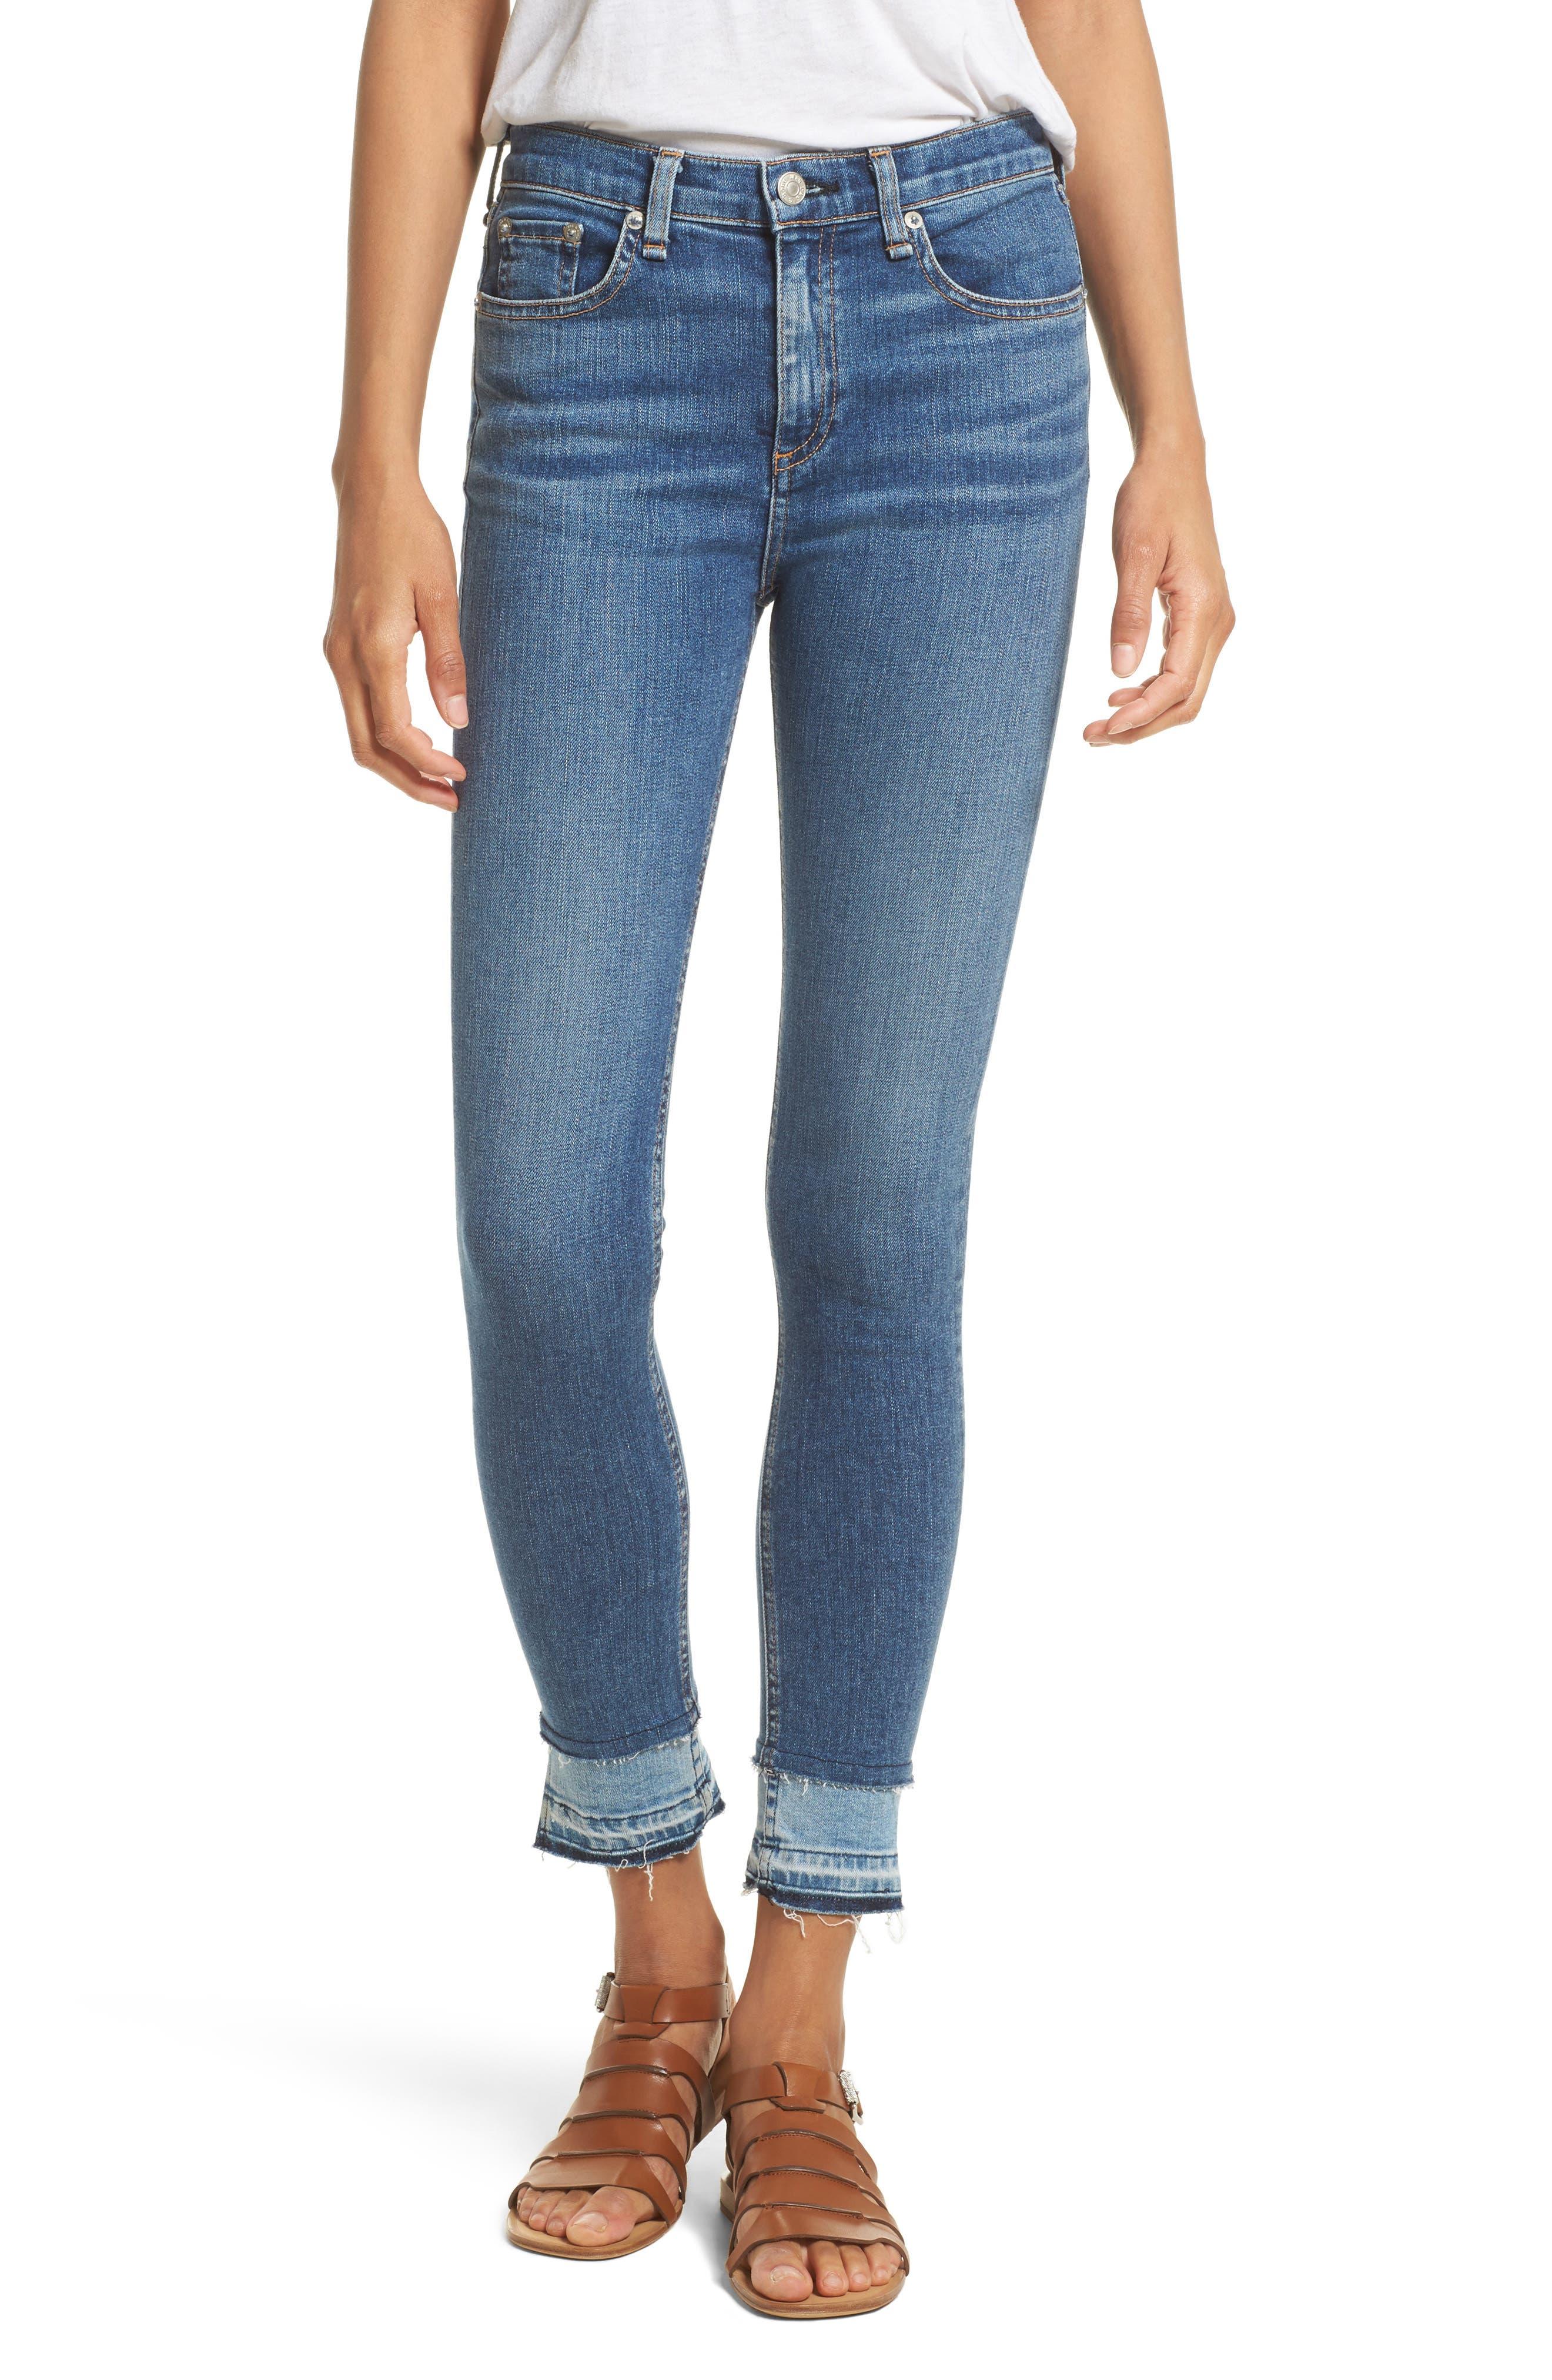 RAG & BONE, High Waist Ankle Skinny Jeans, Main thumbnail 1, color, 427